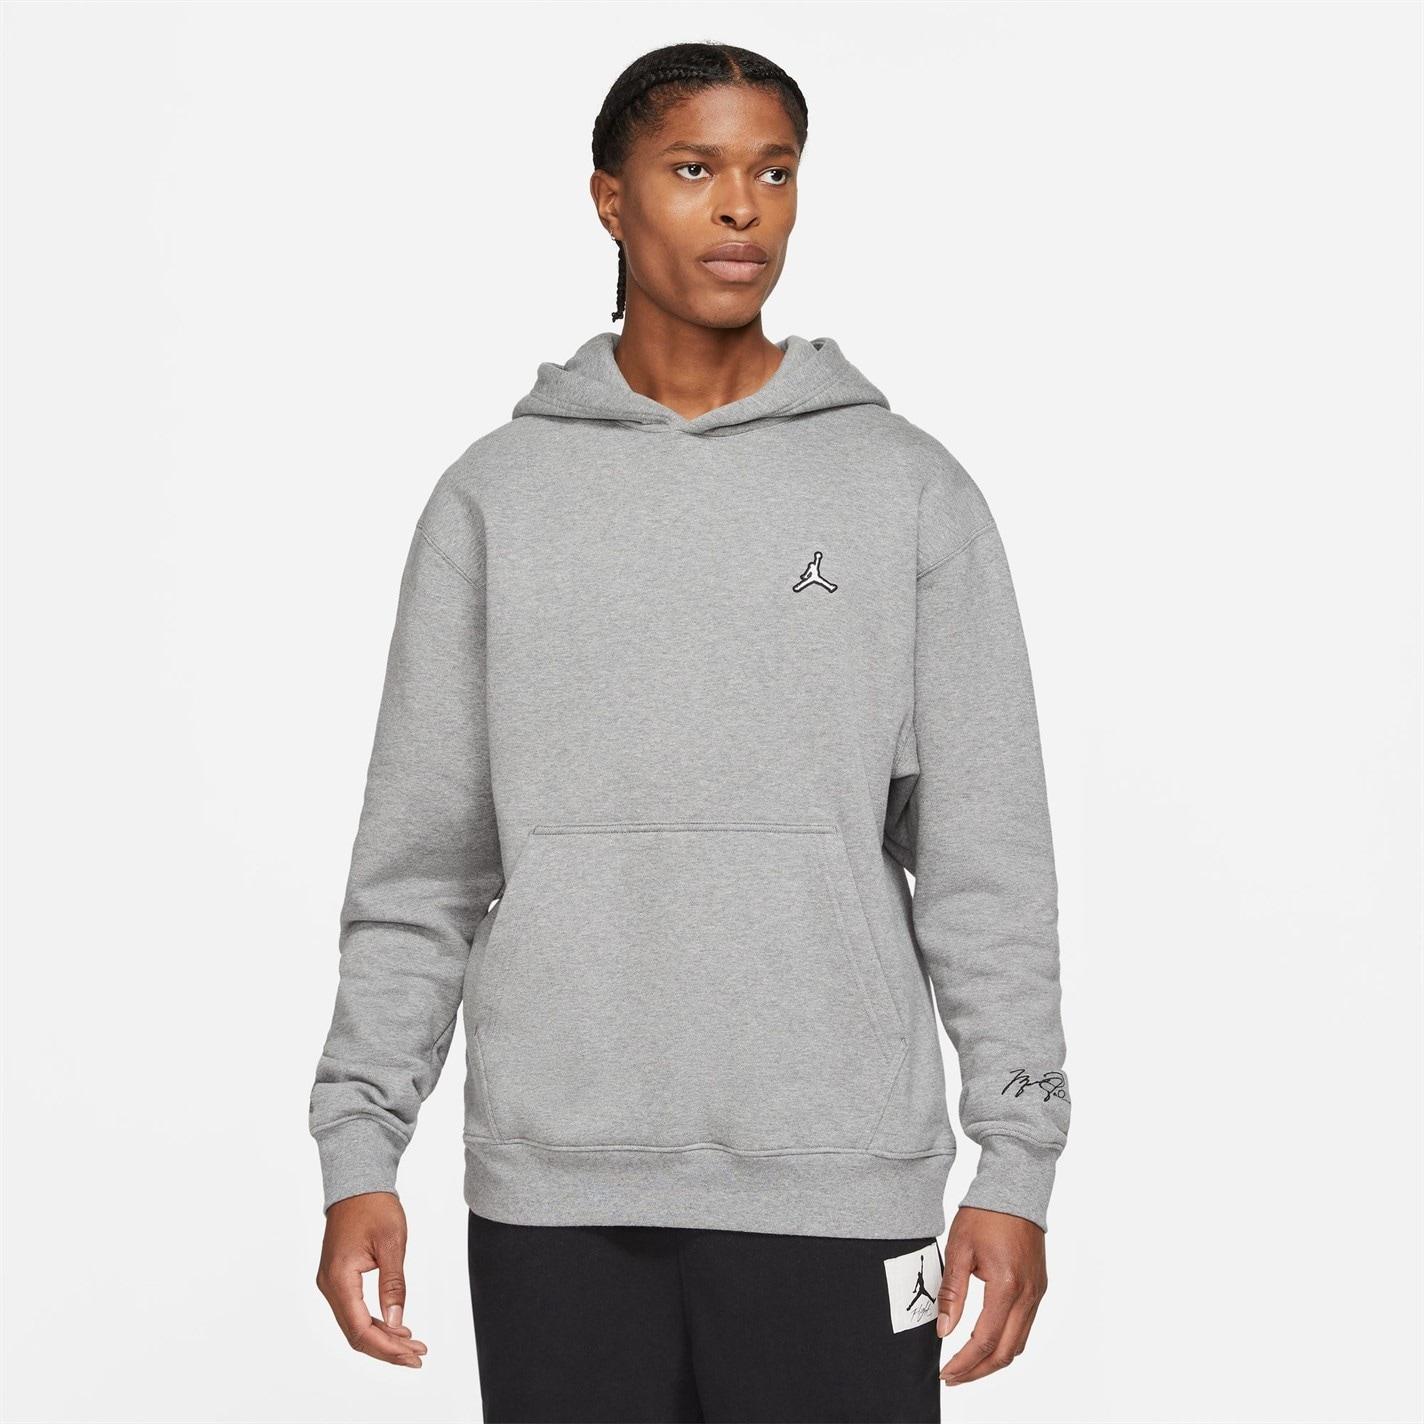 Bluze Pulovere Hanorac Air Jordan Essentials pentru Barbati gri